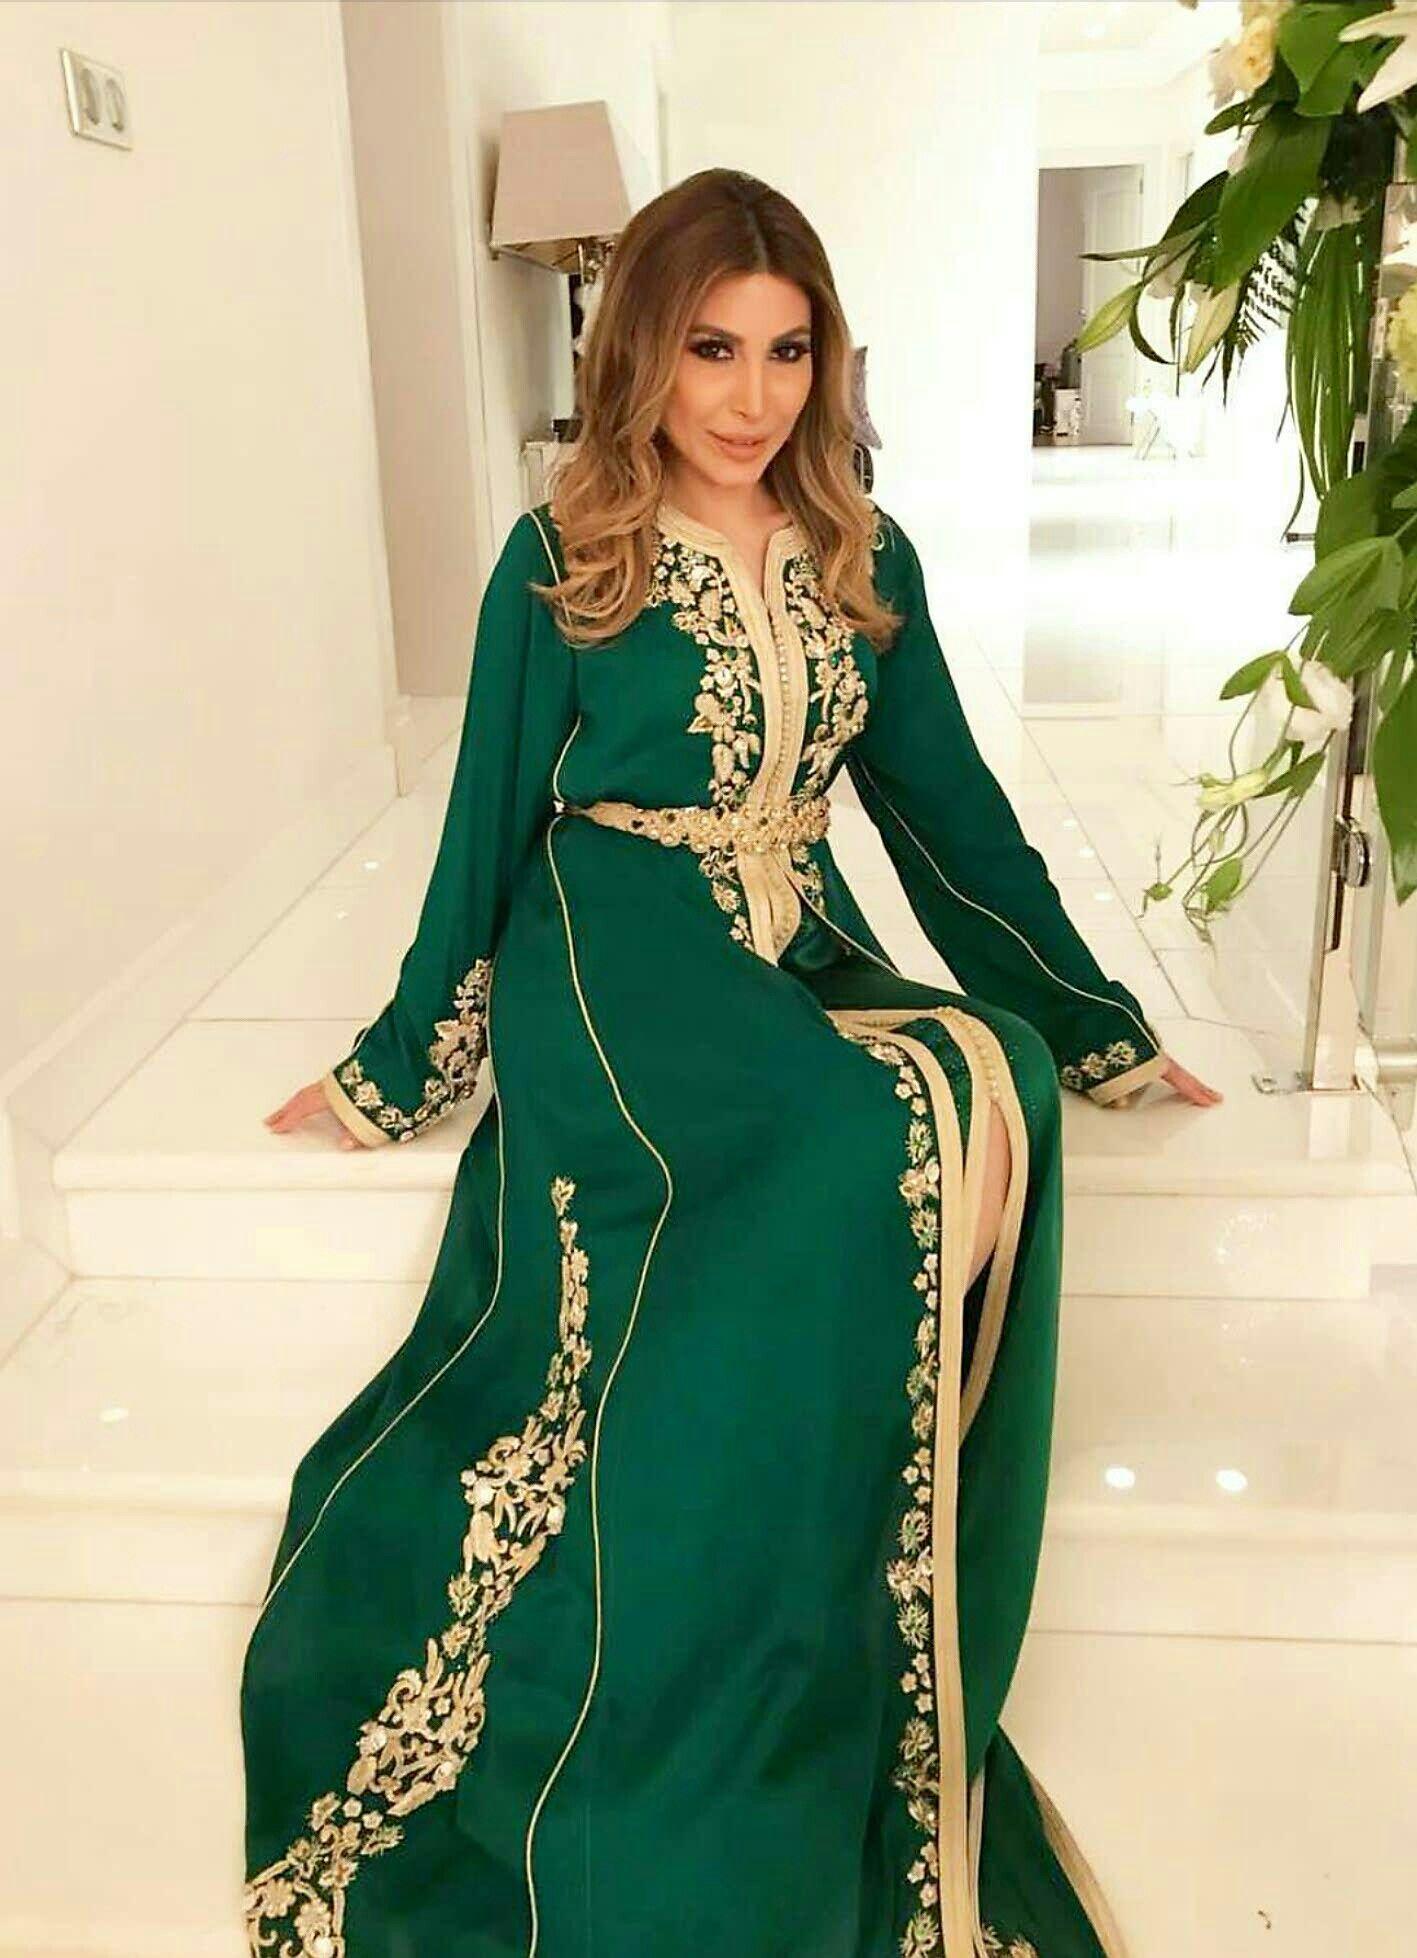 Caftan du Maroc  07245c5b07f